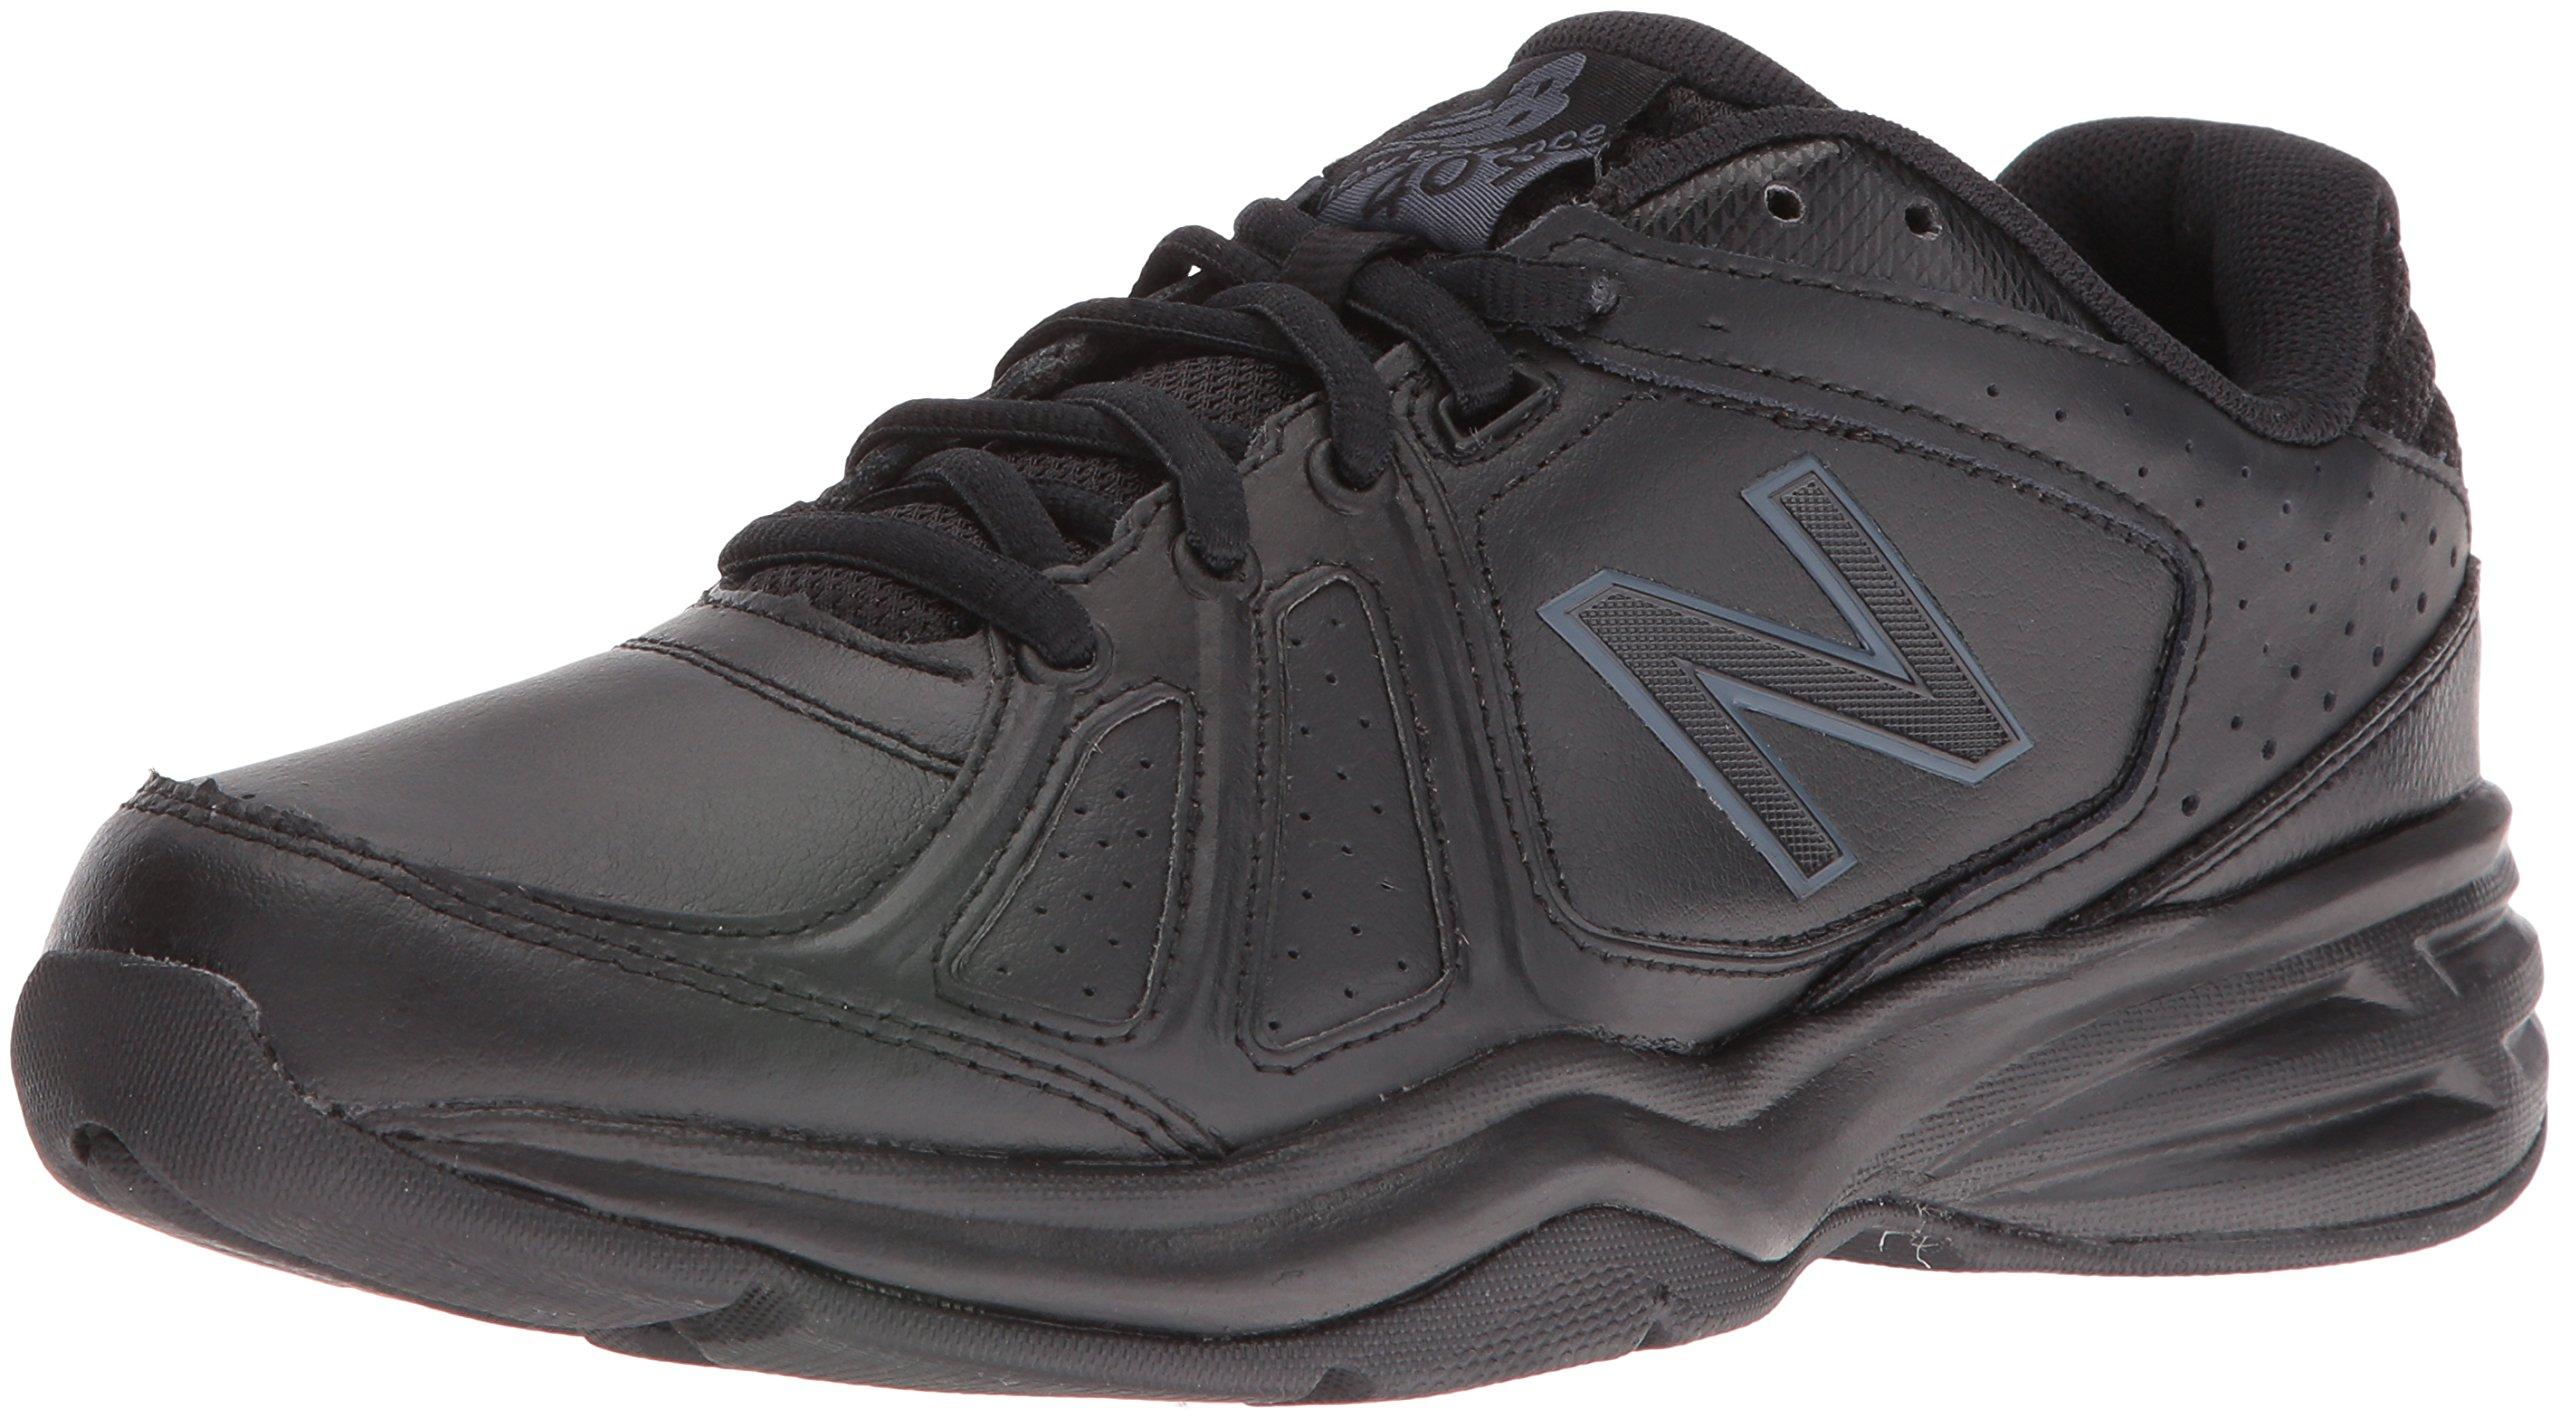 New Balance Men's mx409v3 Casual Comfort Training Shoe, Black, 7 XW US